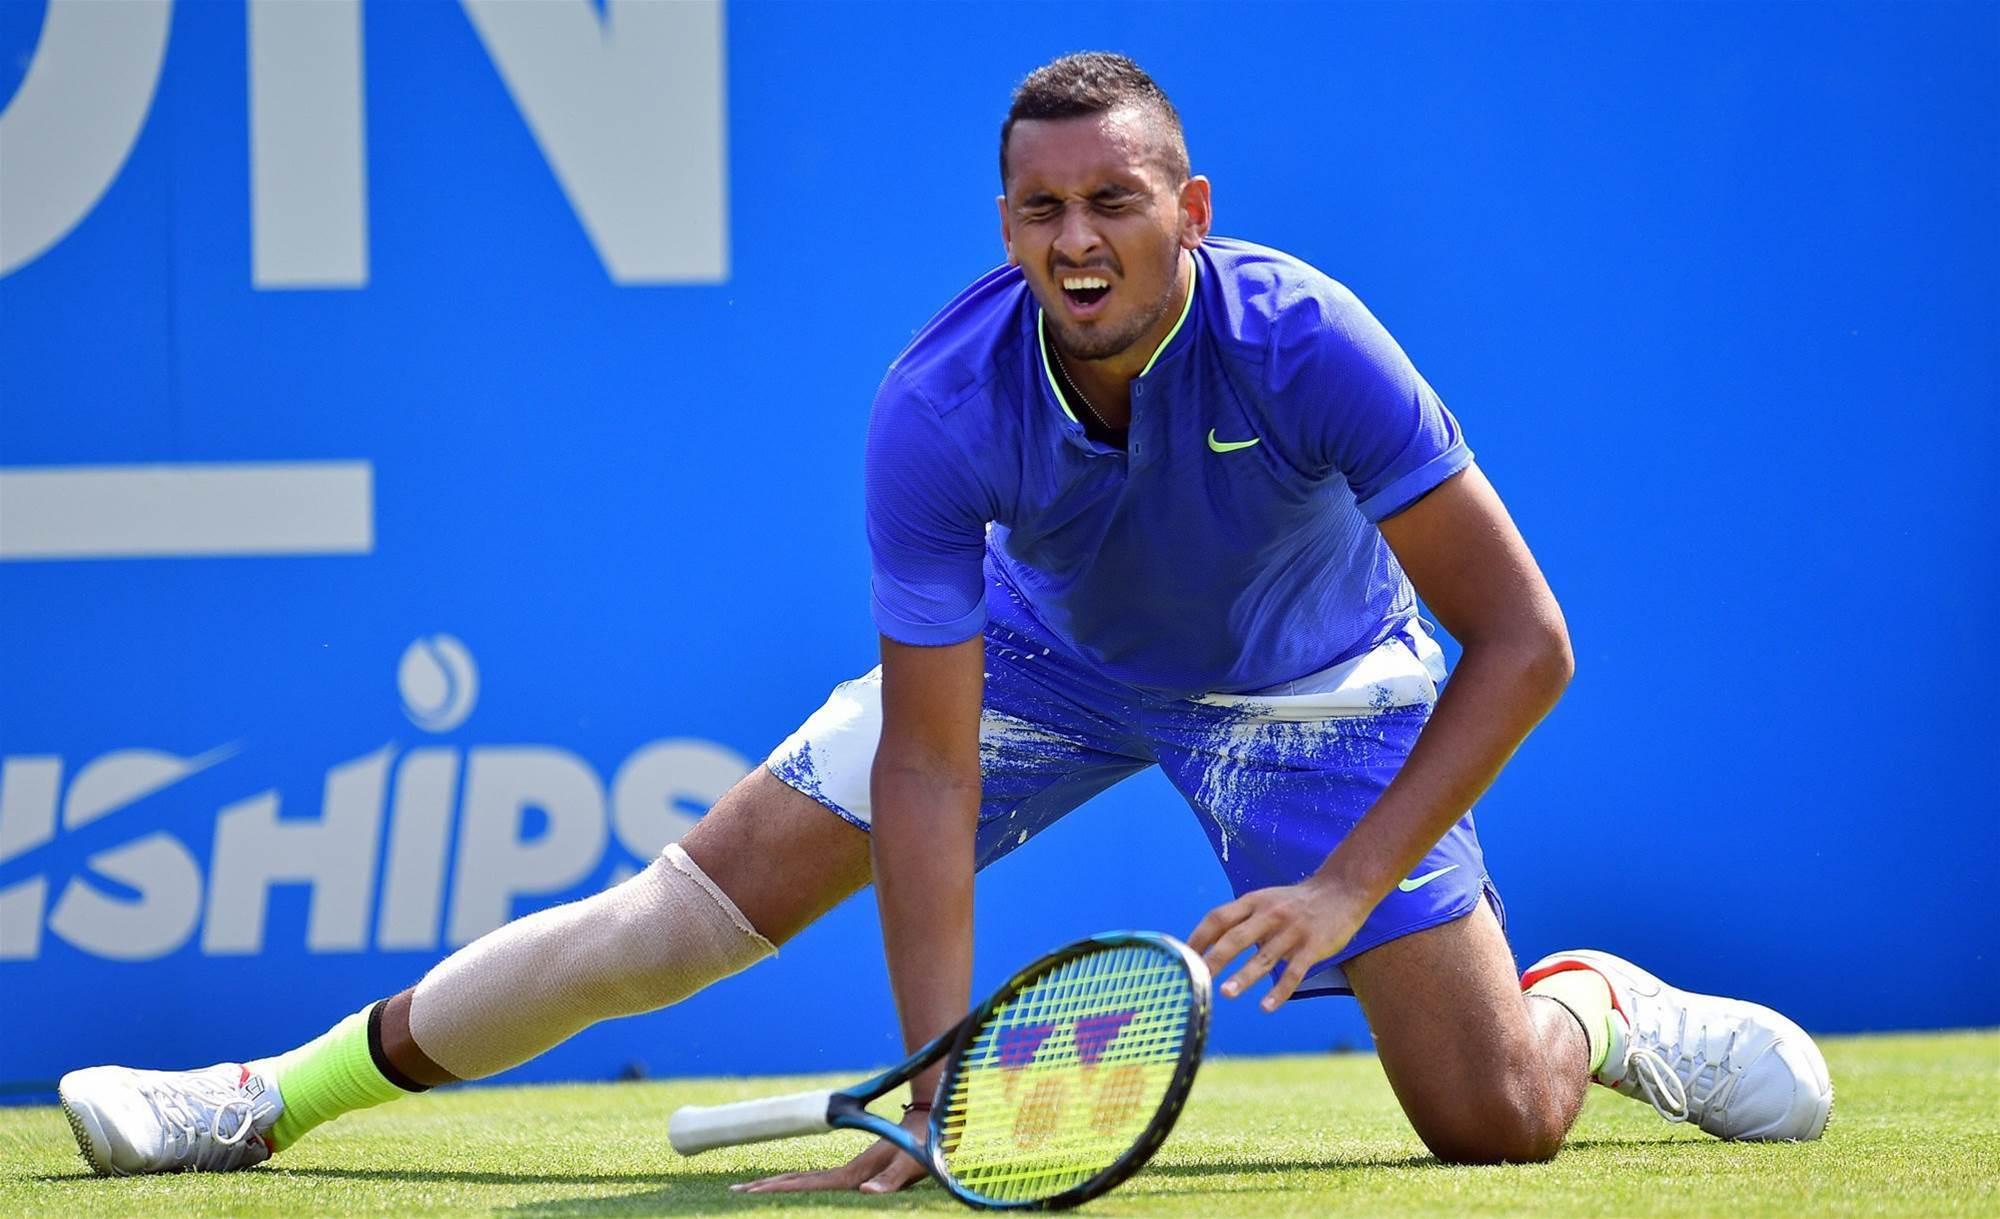 Kyrgios bullish for Wimbledon despite retiring hurt